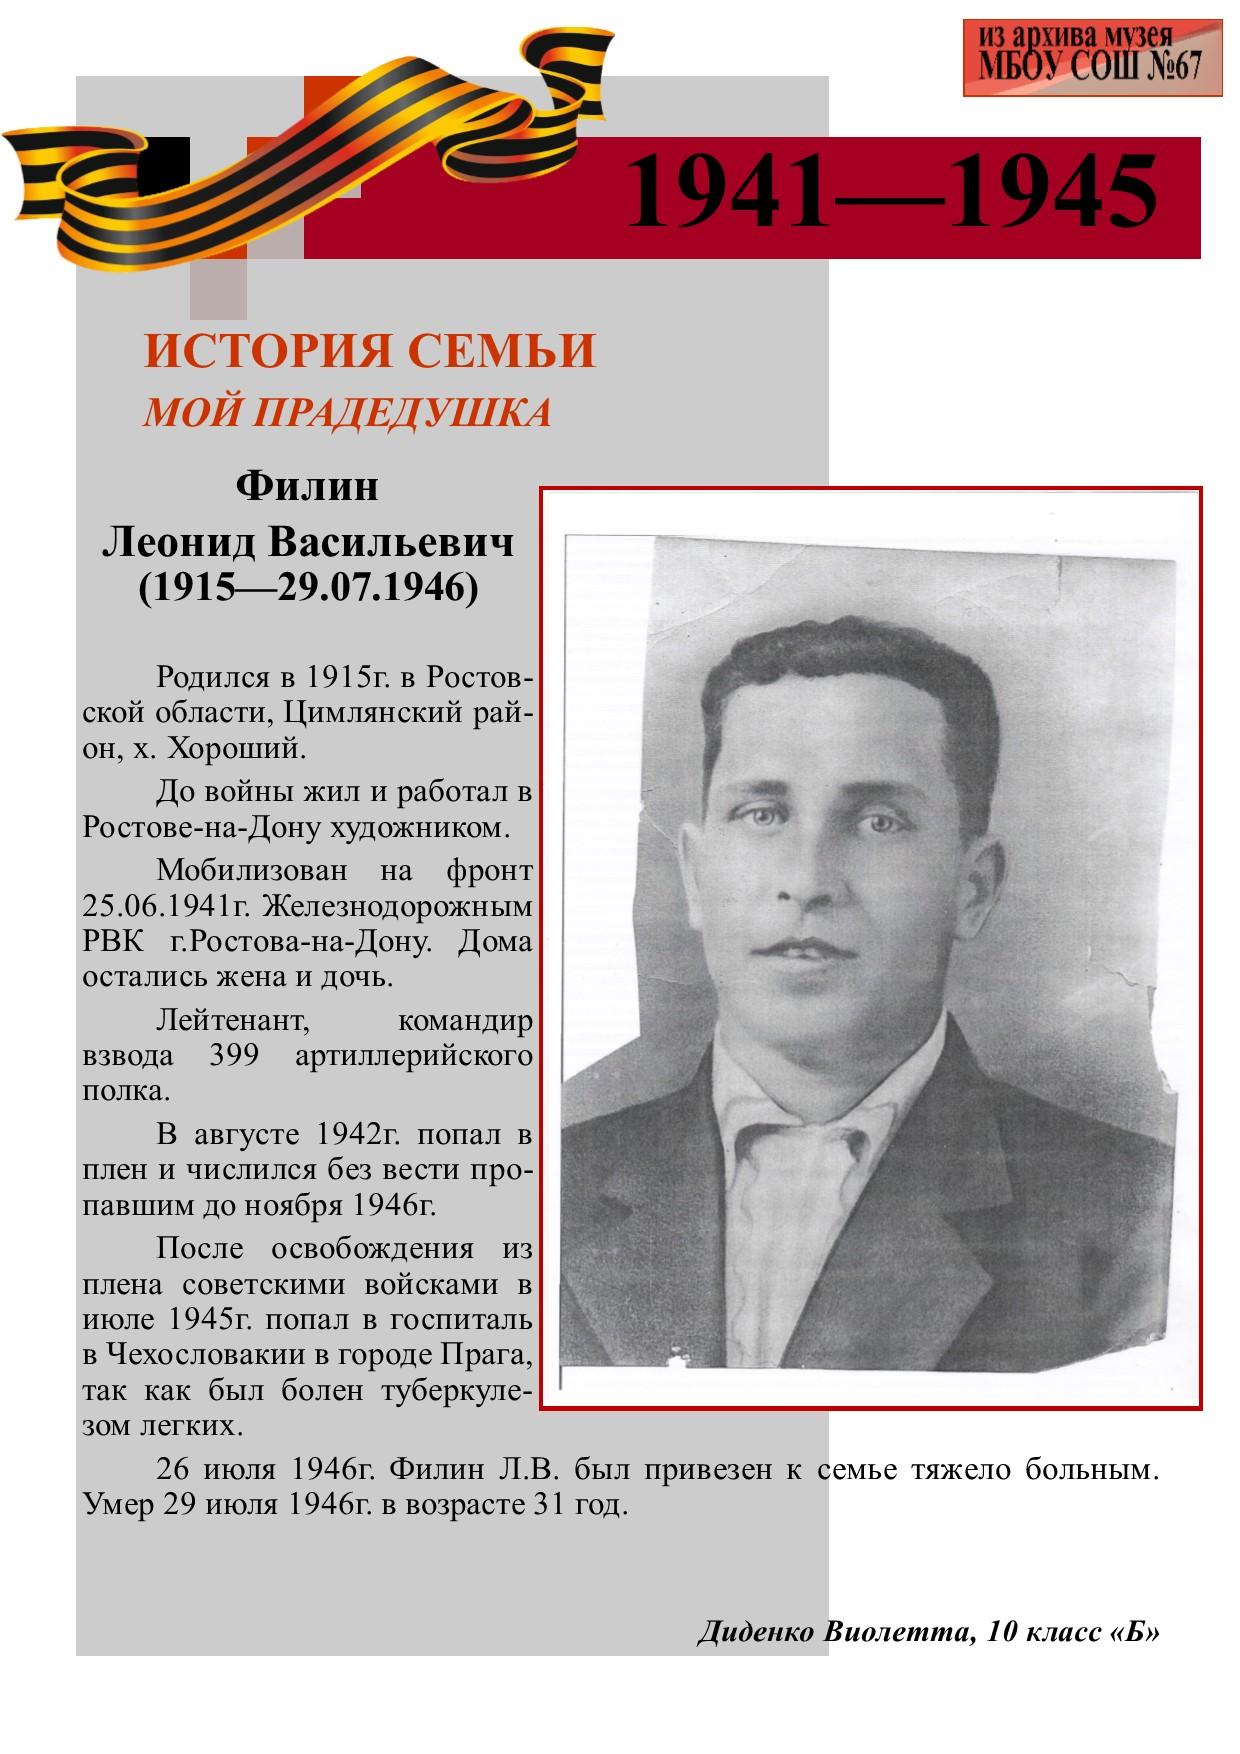 Филин Леонид Васильевич